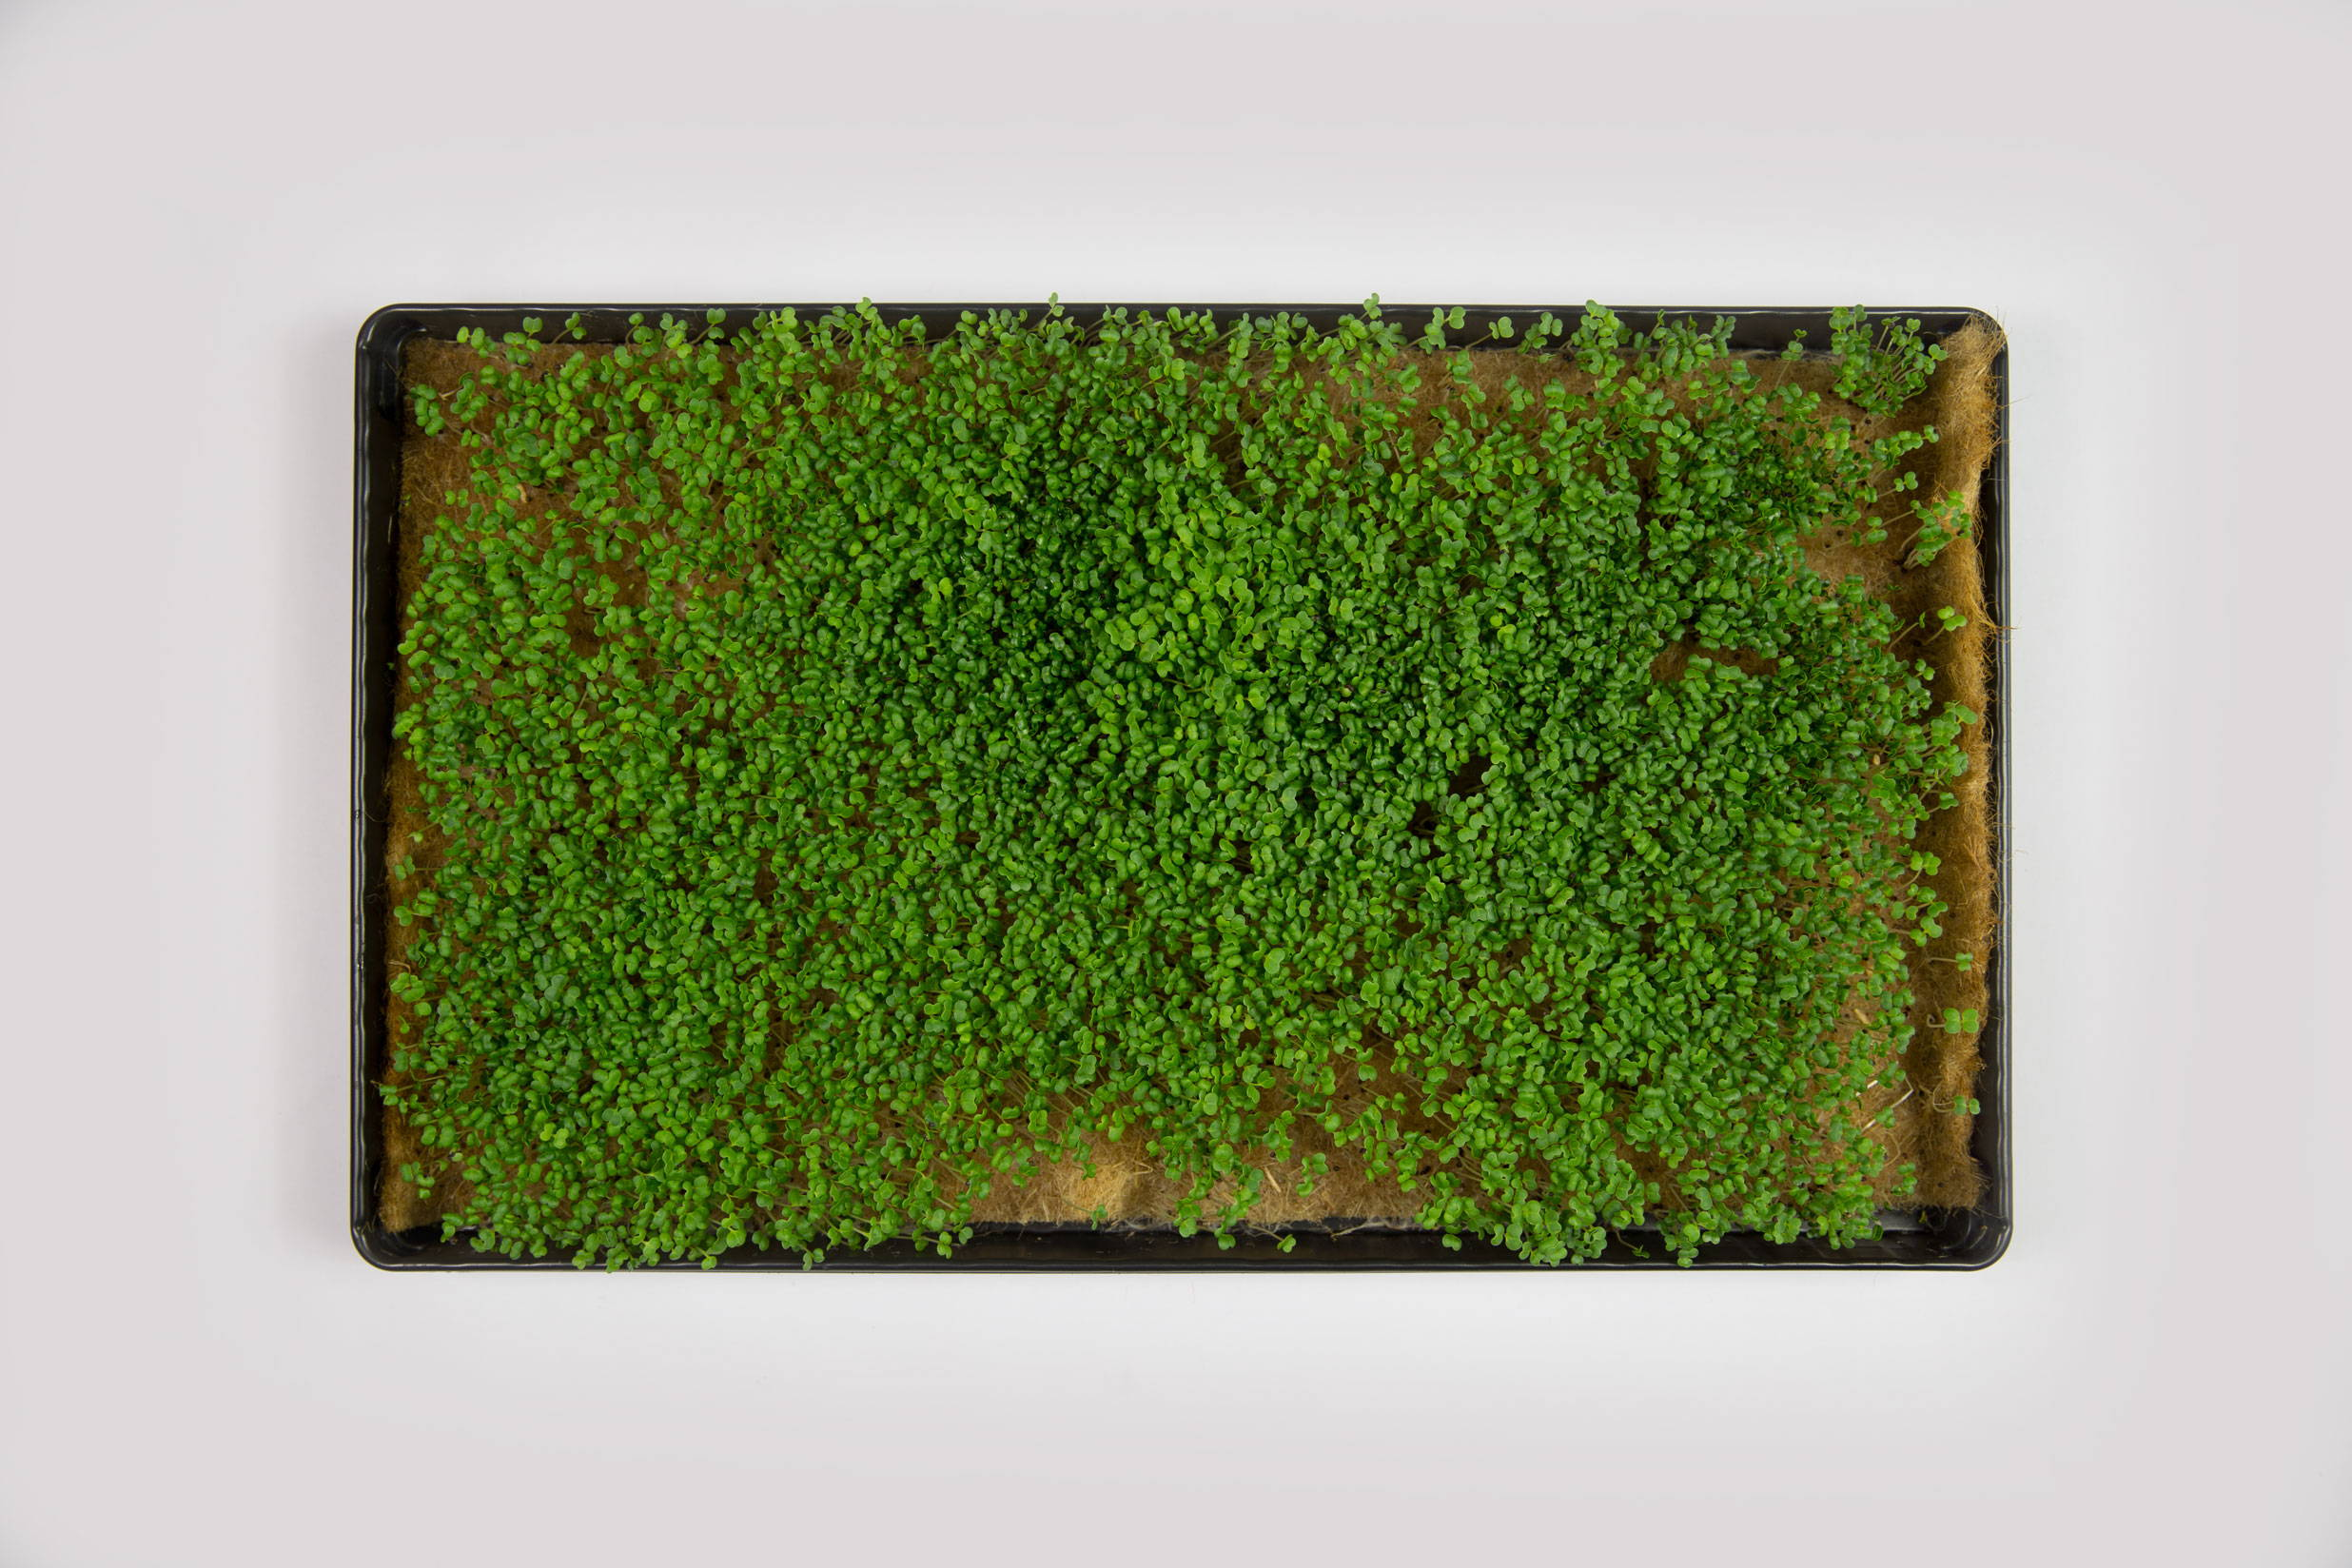 Cima di Rapa Microgreens von der UMAMI Urban Farm